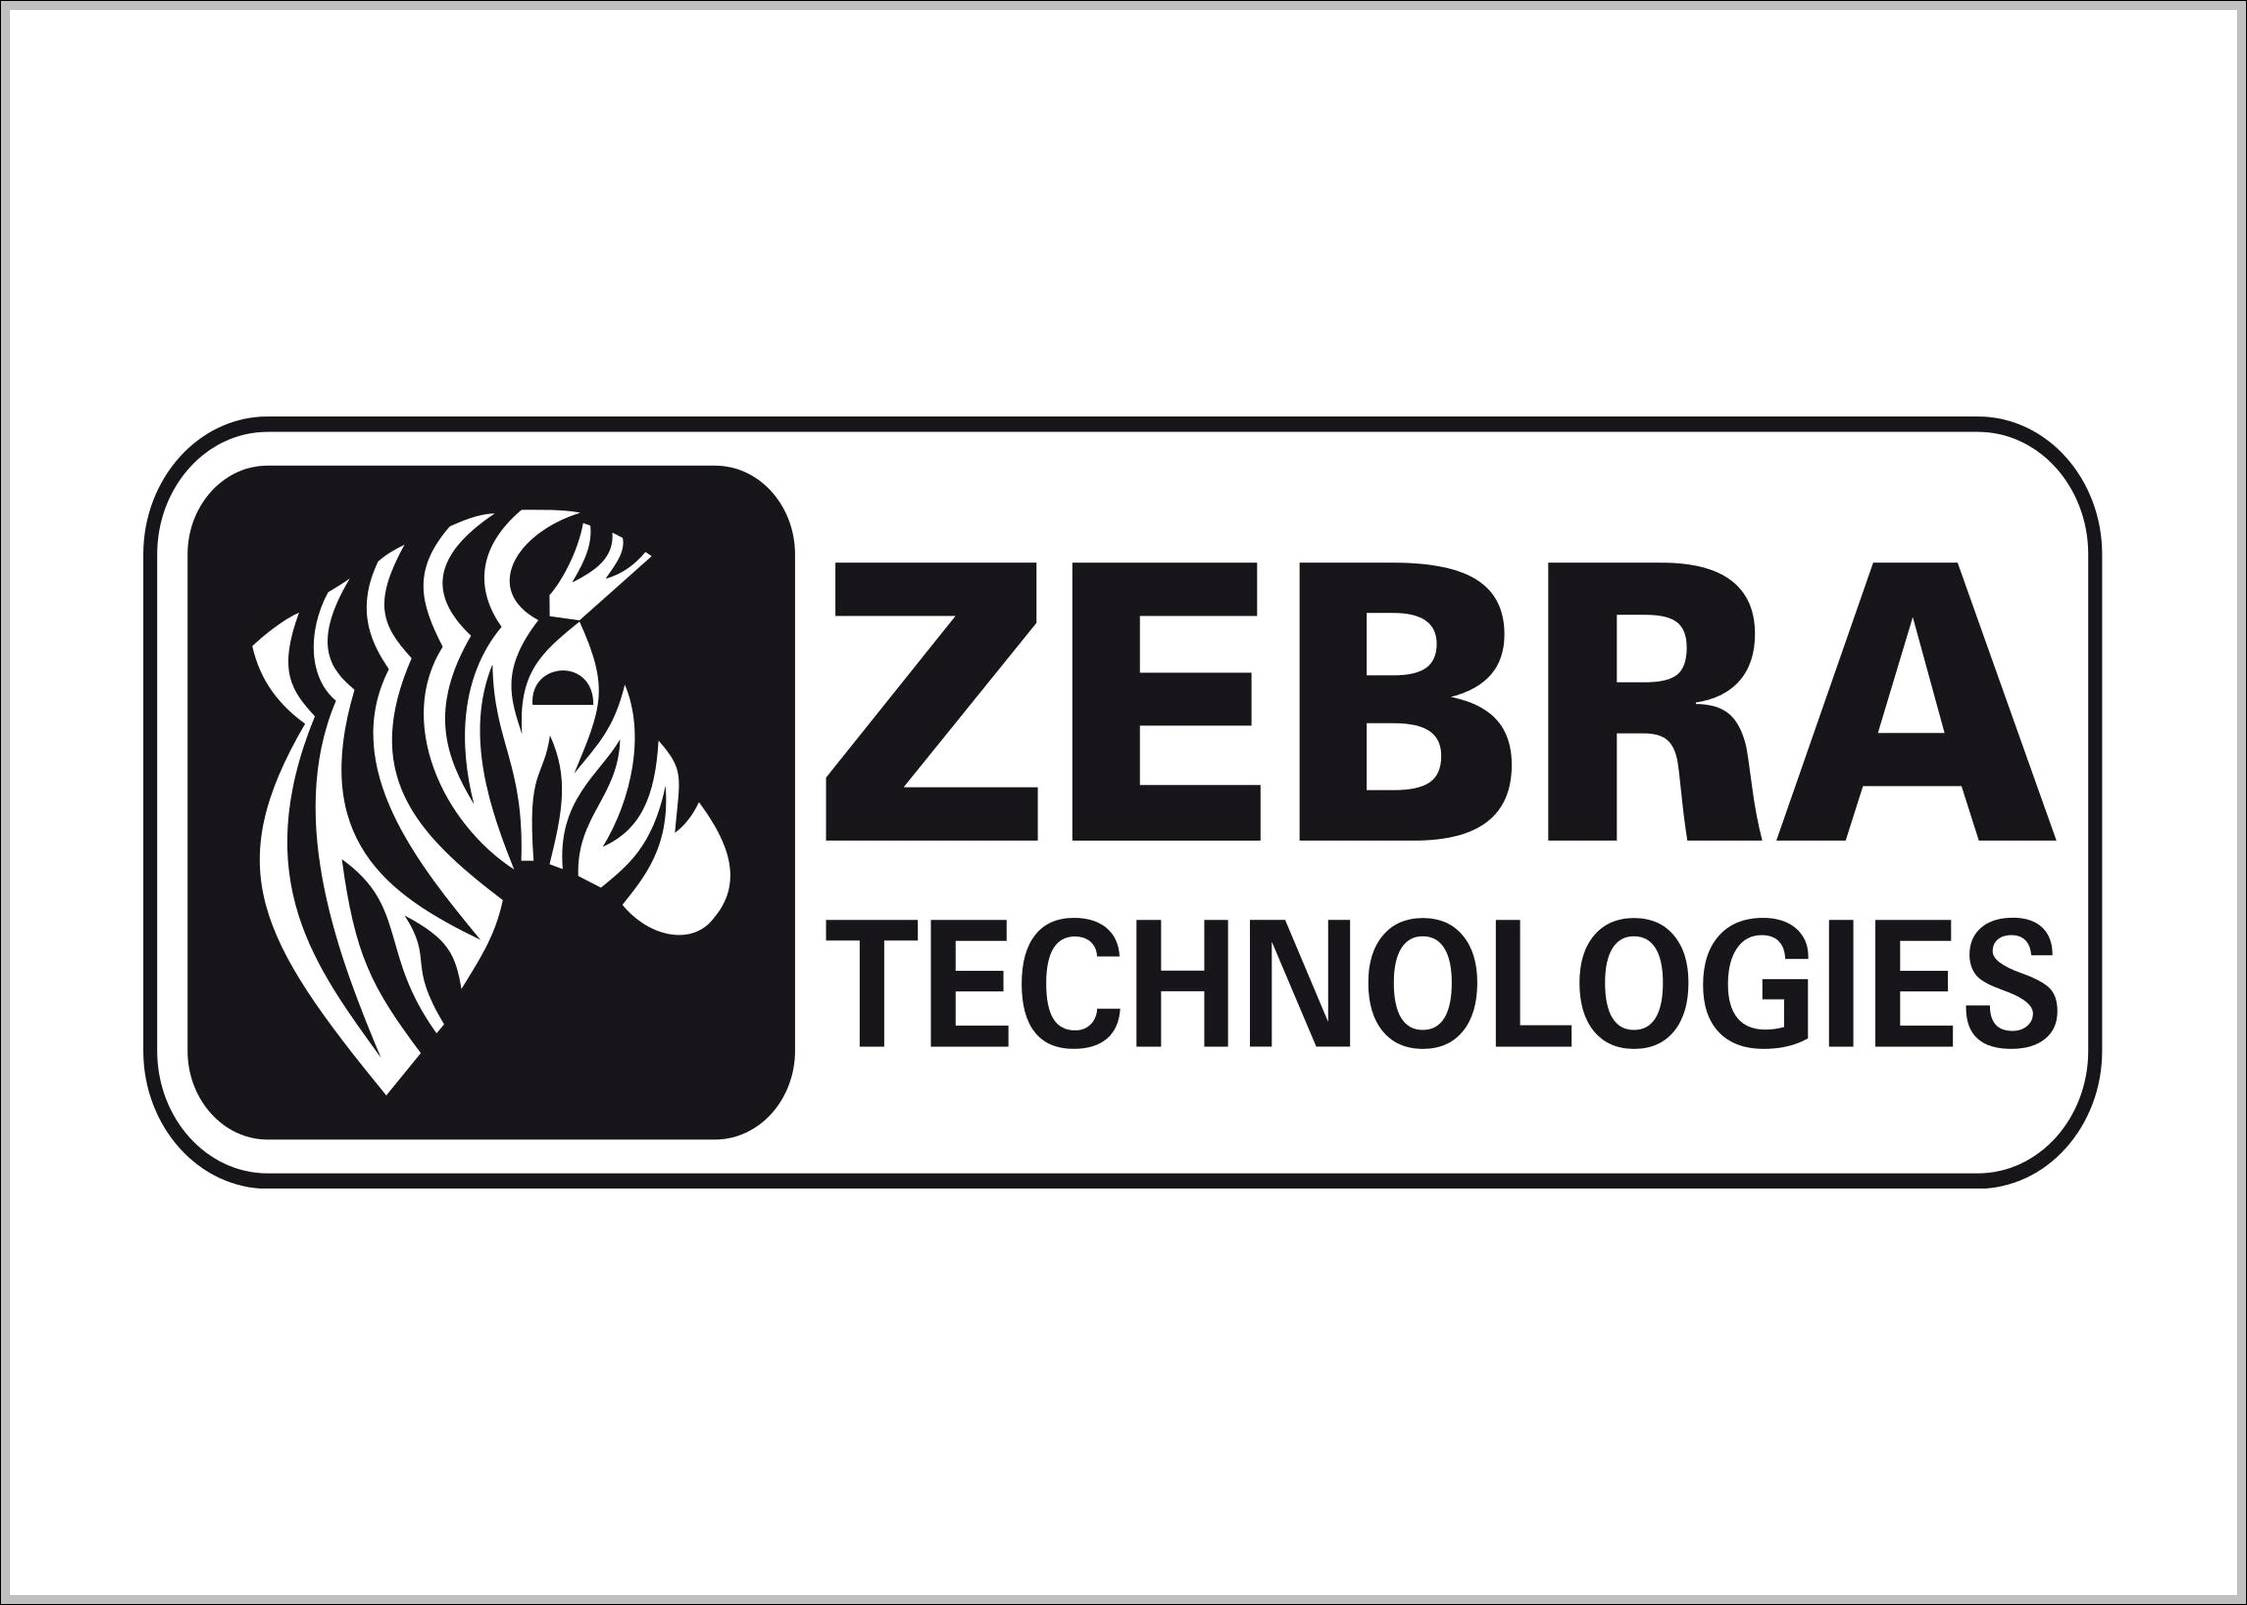 Zebra Technologies logo old